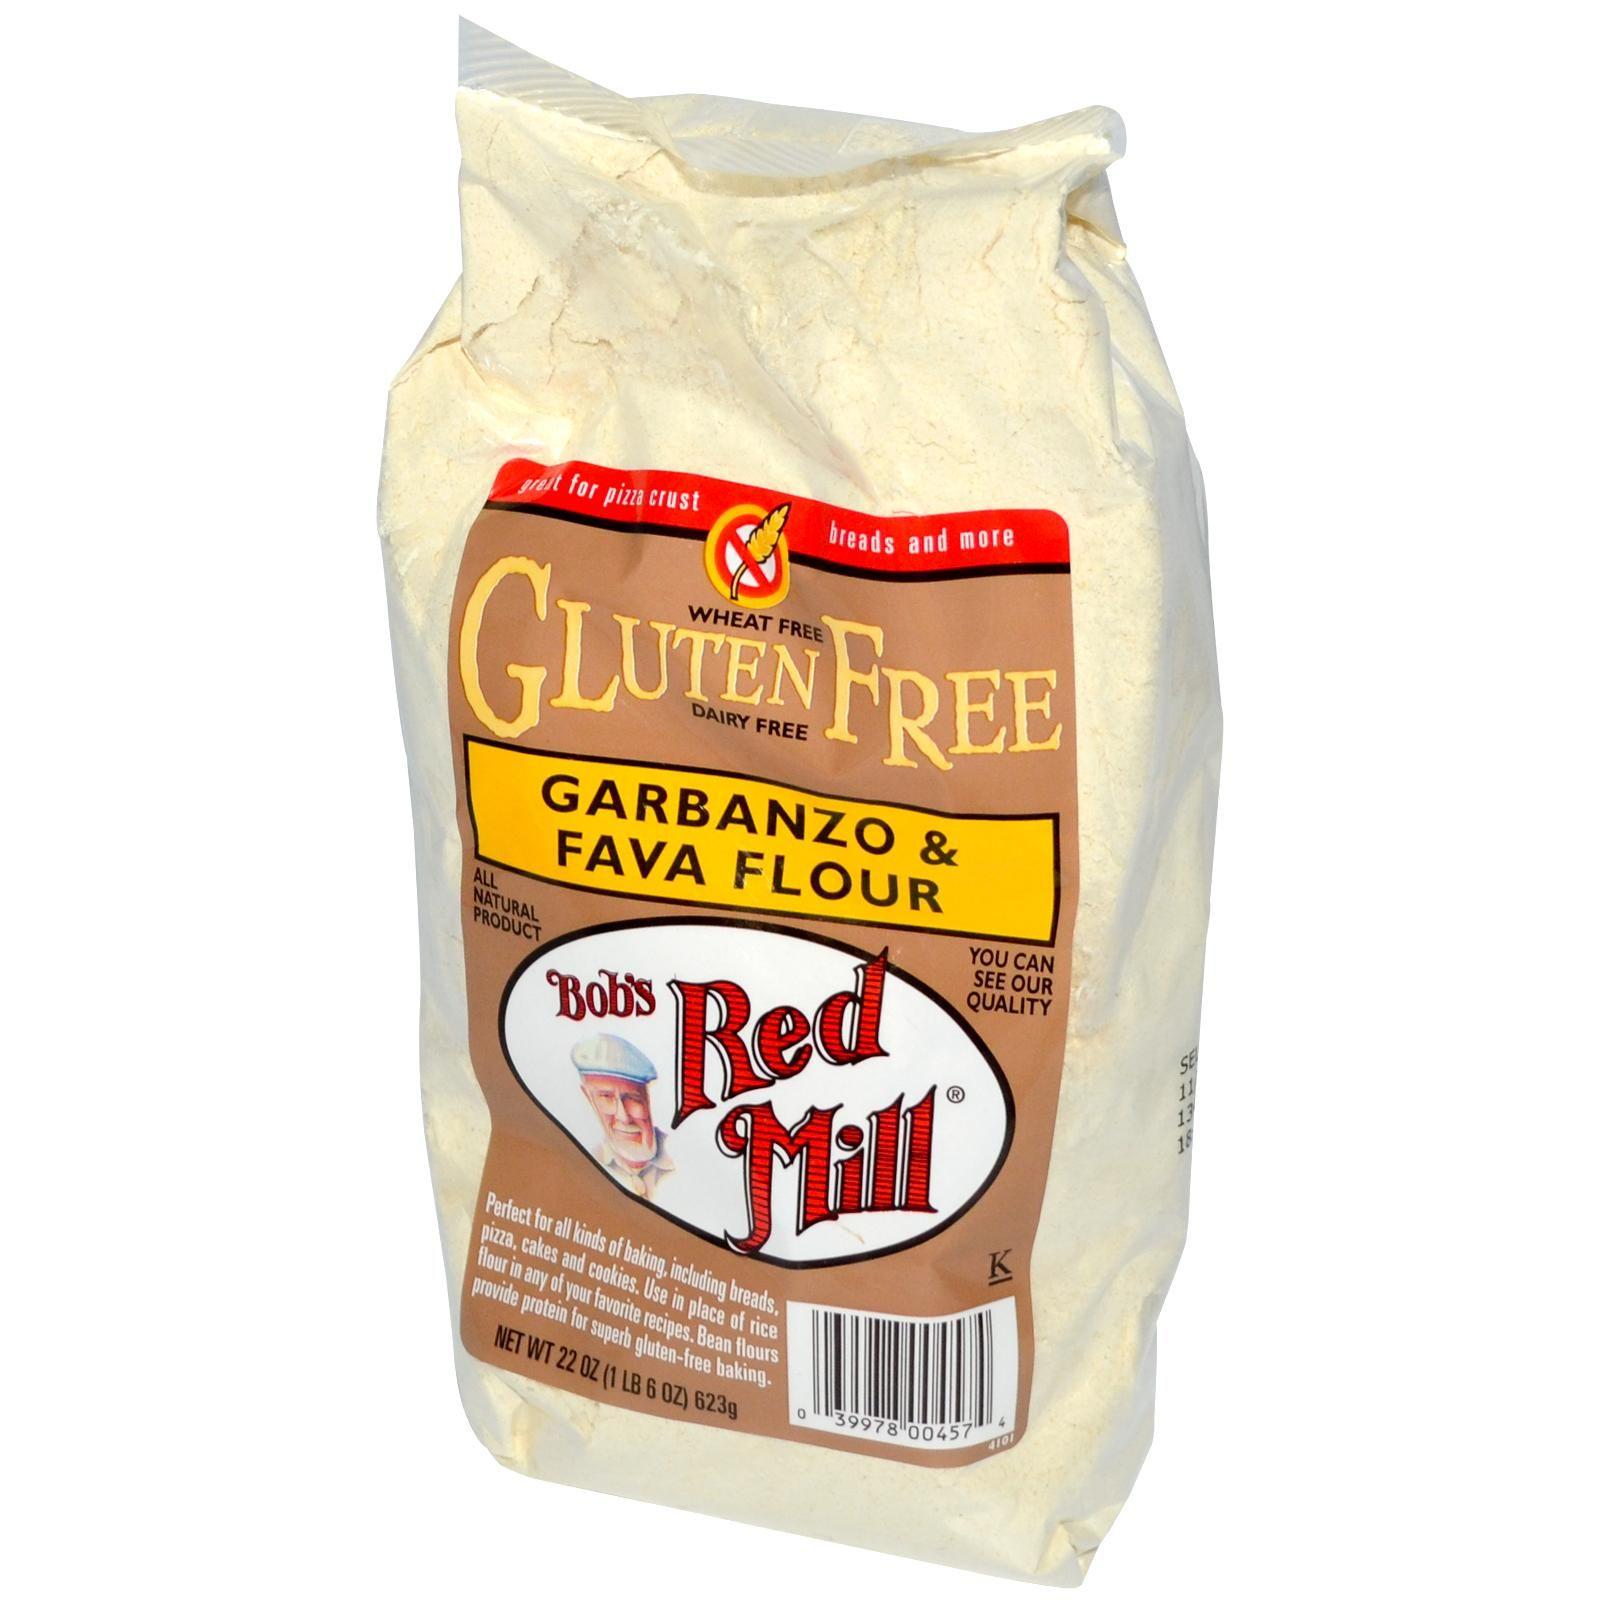 Bob's Red Mill, GF Garbanzo & Fava Flour, 22 oz (623 g